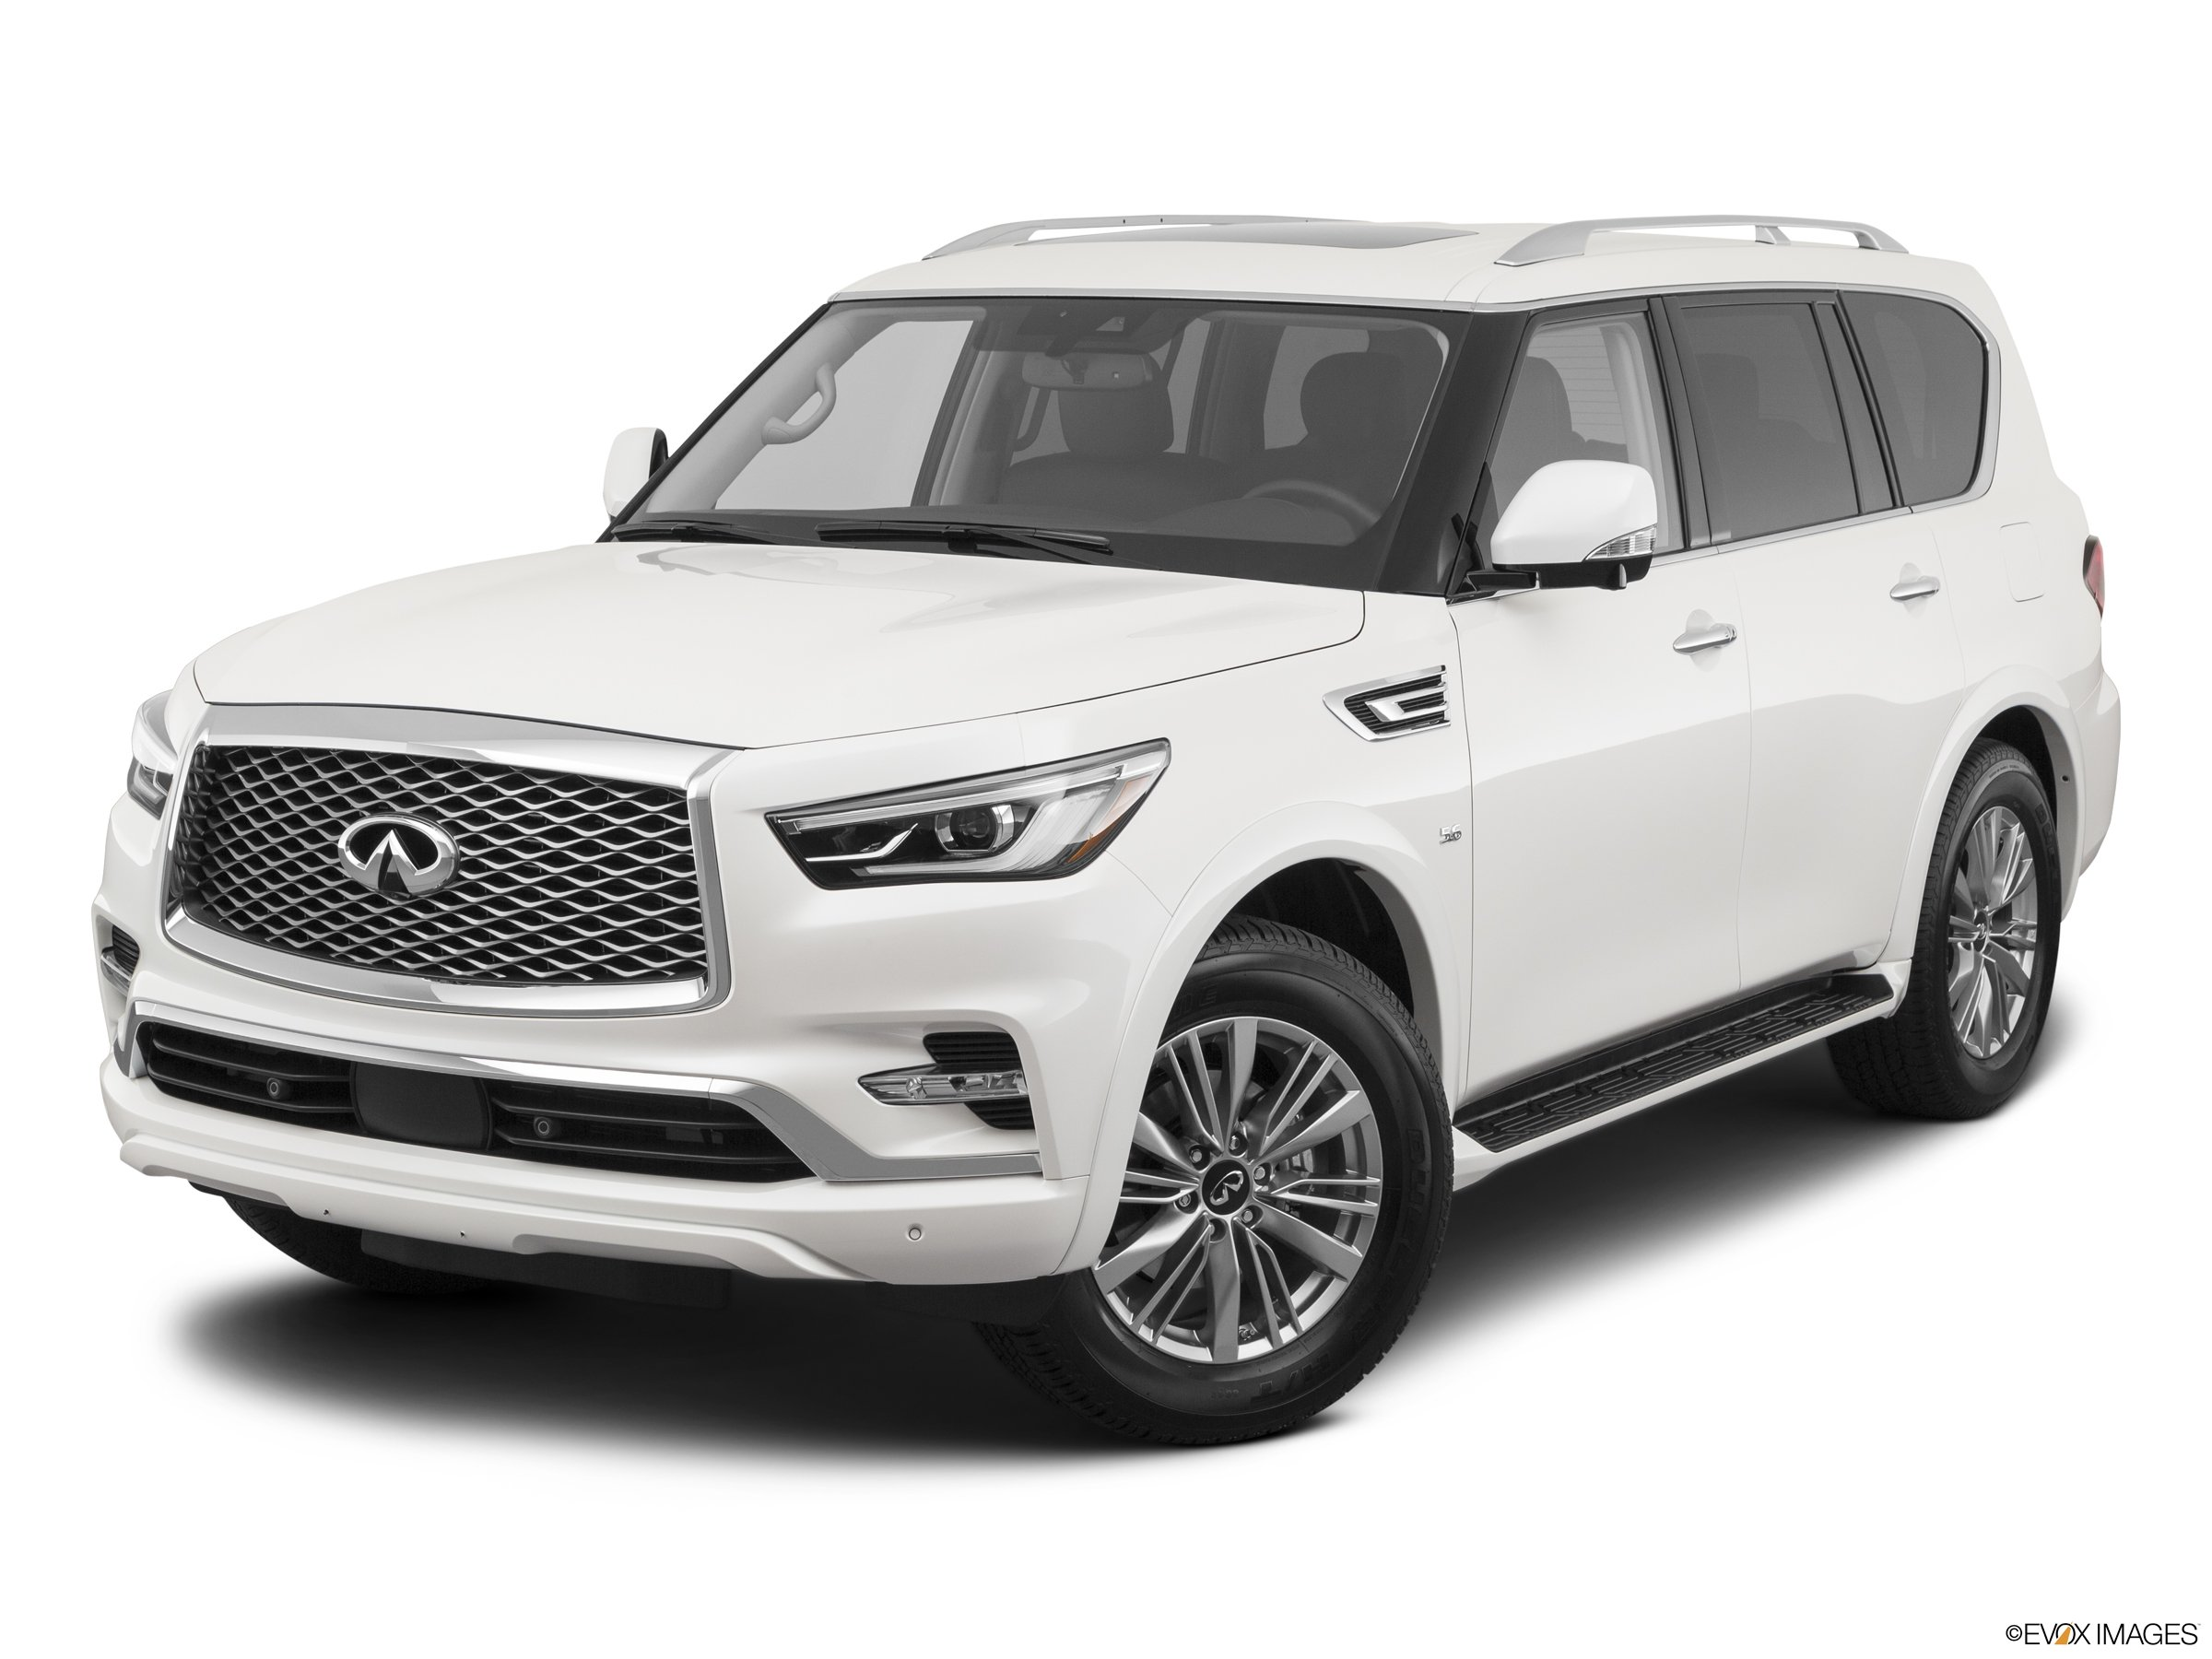 2020 Infiniti QX80 Luxe RWD SUV